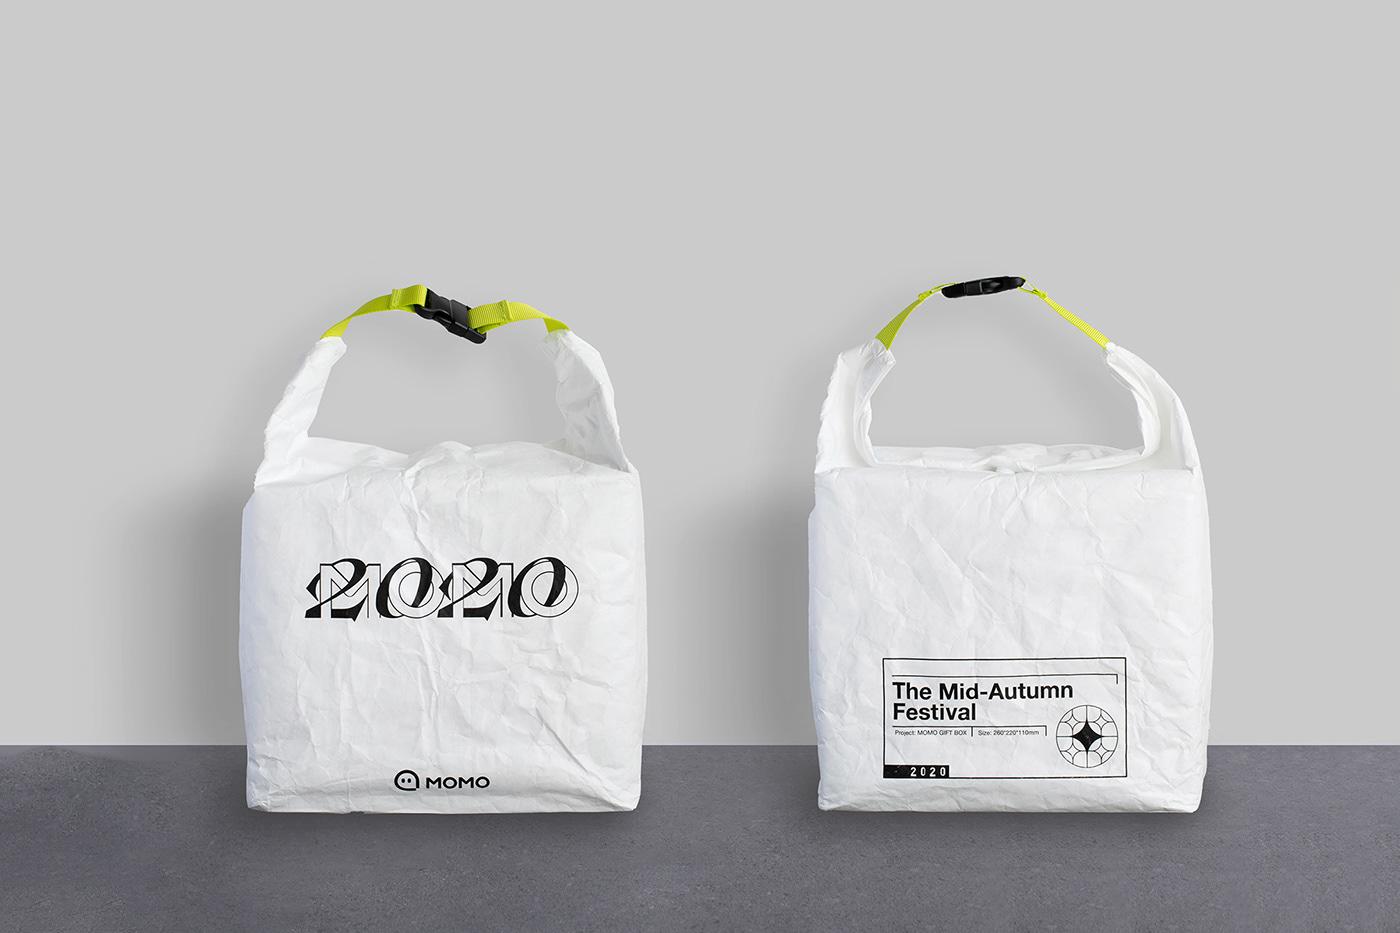 Image may contain: luggage and bags, handbag and bag